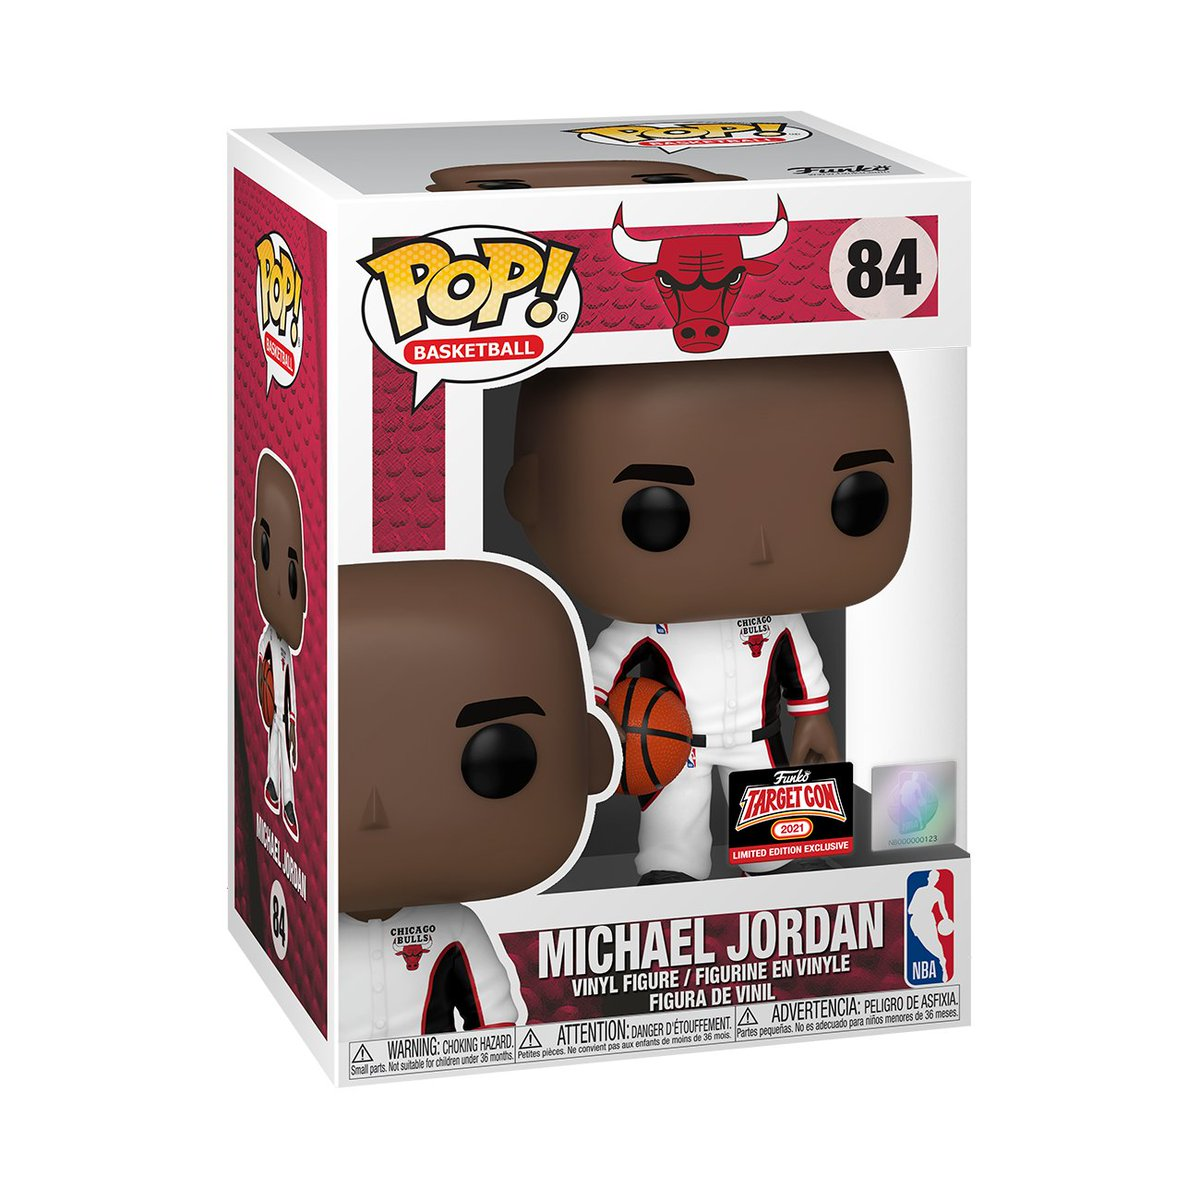 🐐🏀RT & follow @OriginalFunko for the chance to WIN this #TargetCon exclusive Michael Jordan Pop! #FunkoGiveaway #Giveaway #MichaelJordan #FunkoTargetCon